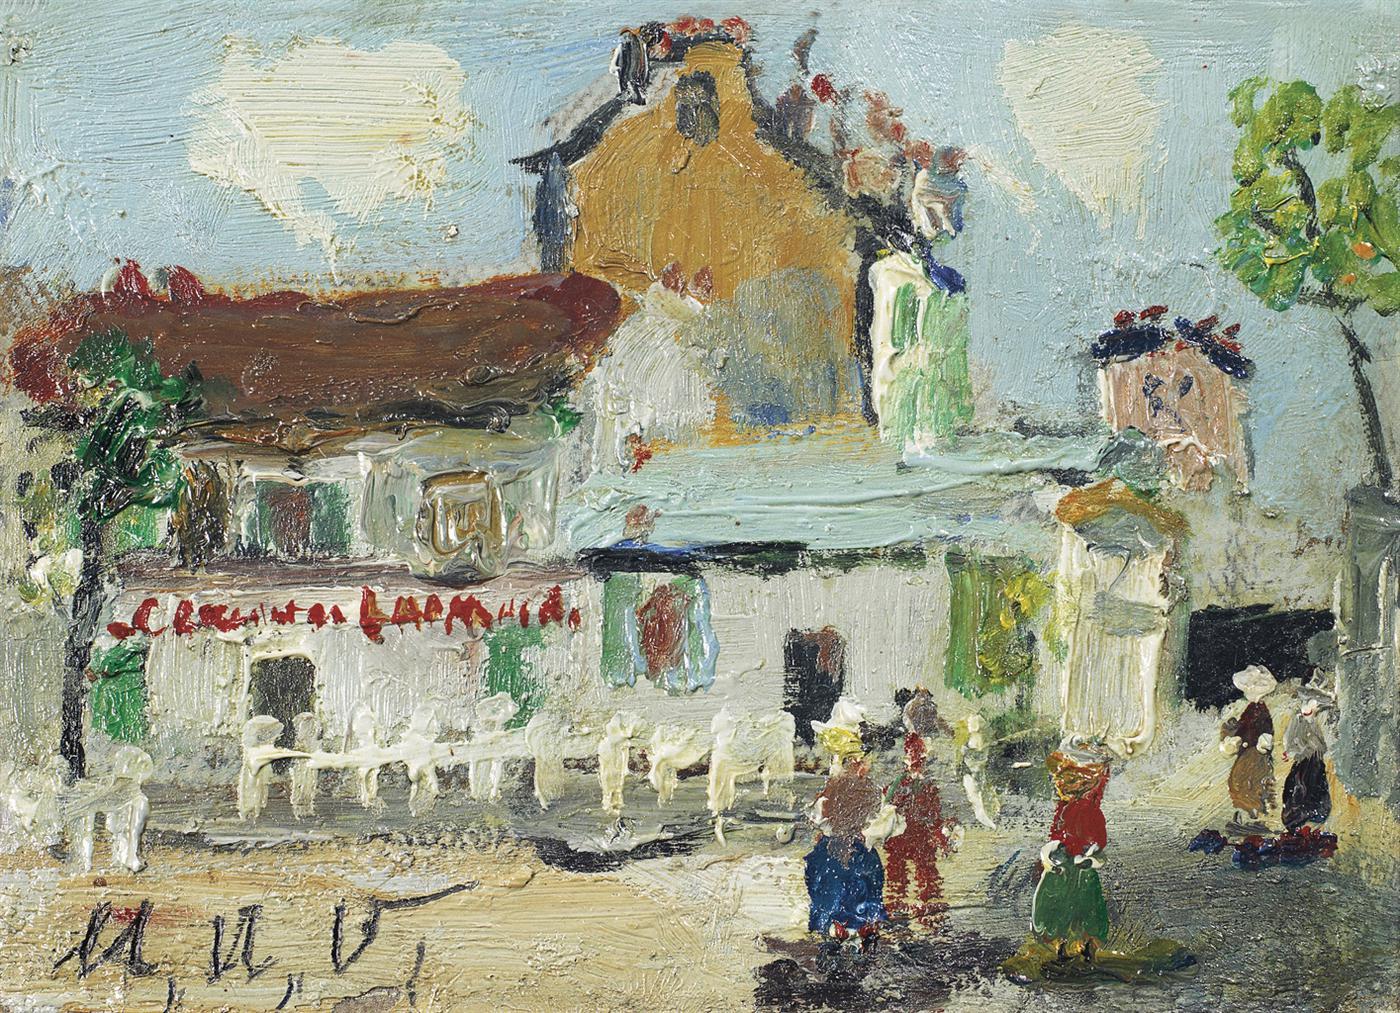 Maurice Utrillo-Le Lapin Agile A Montmartre-1940